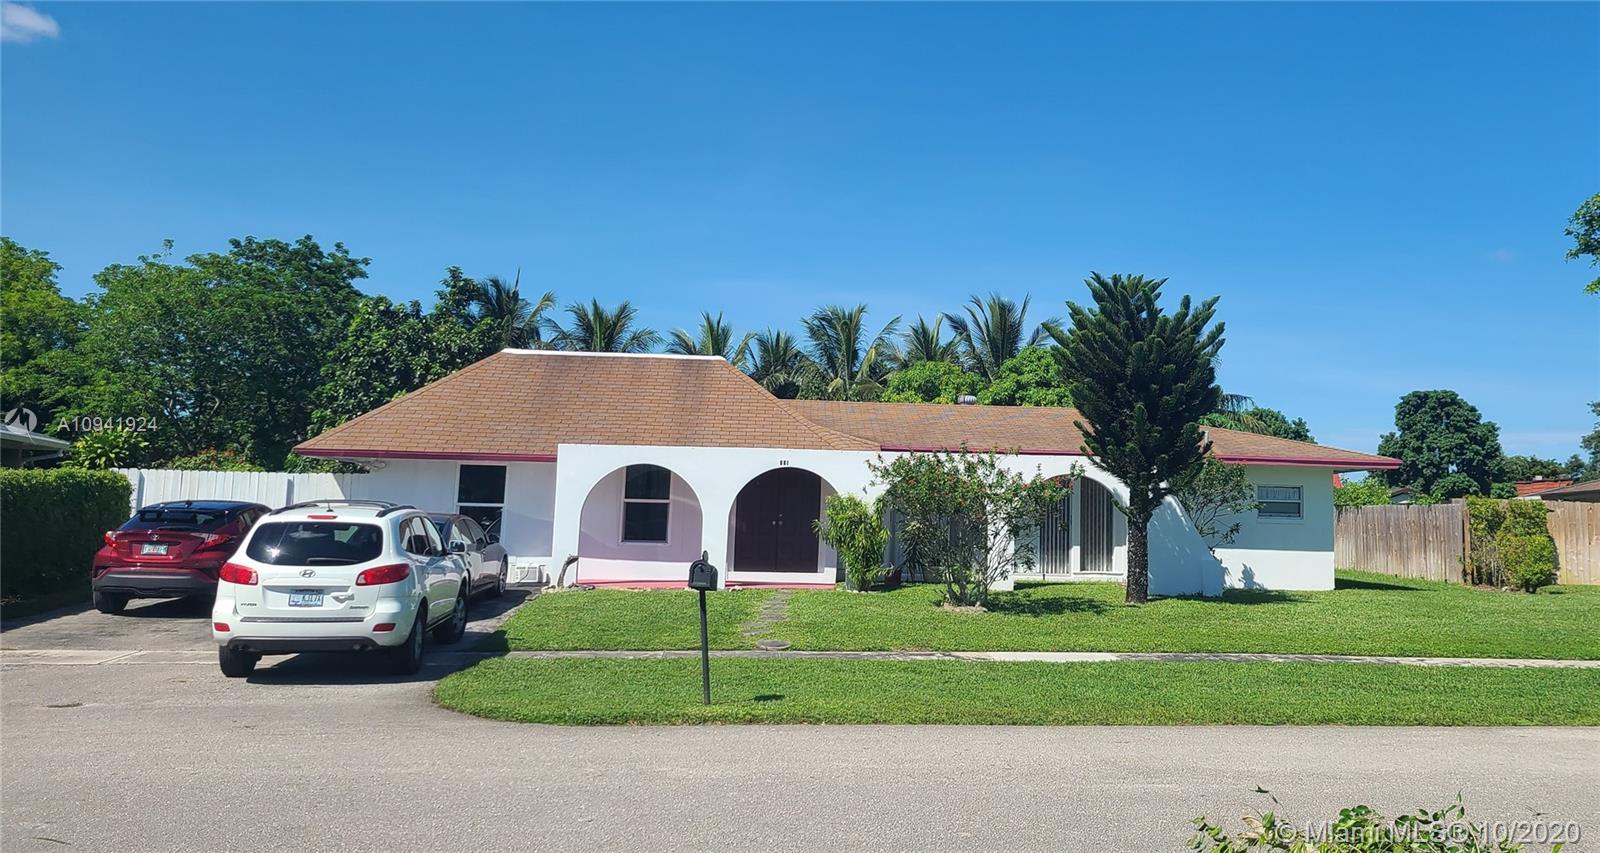 931 Hibiscus Drive, Royal Palm Beach, Florida 33411